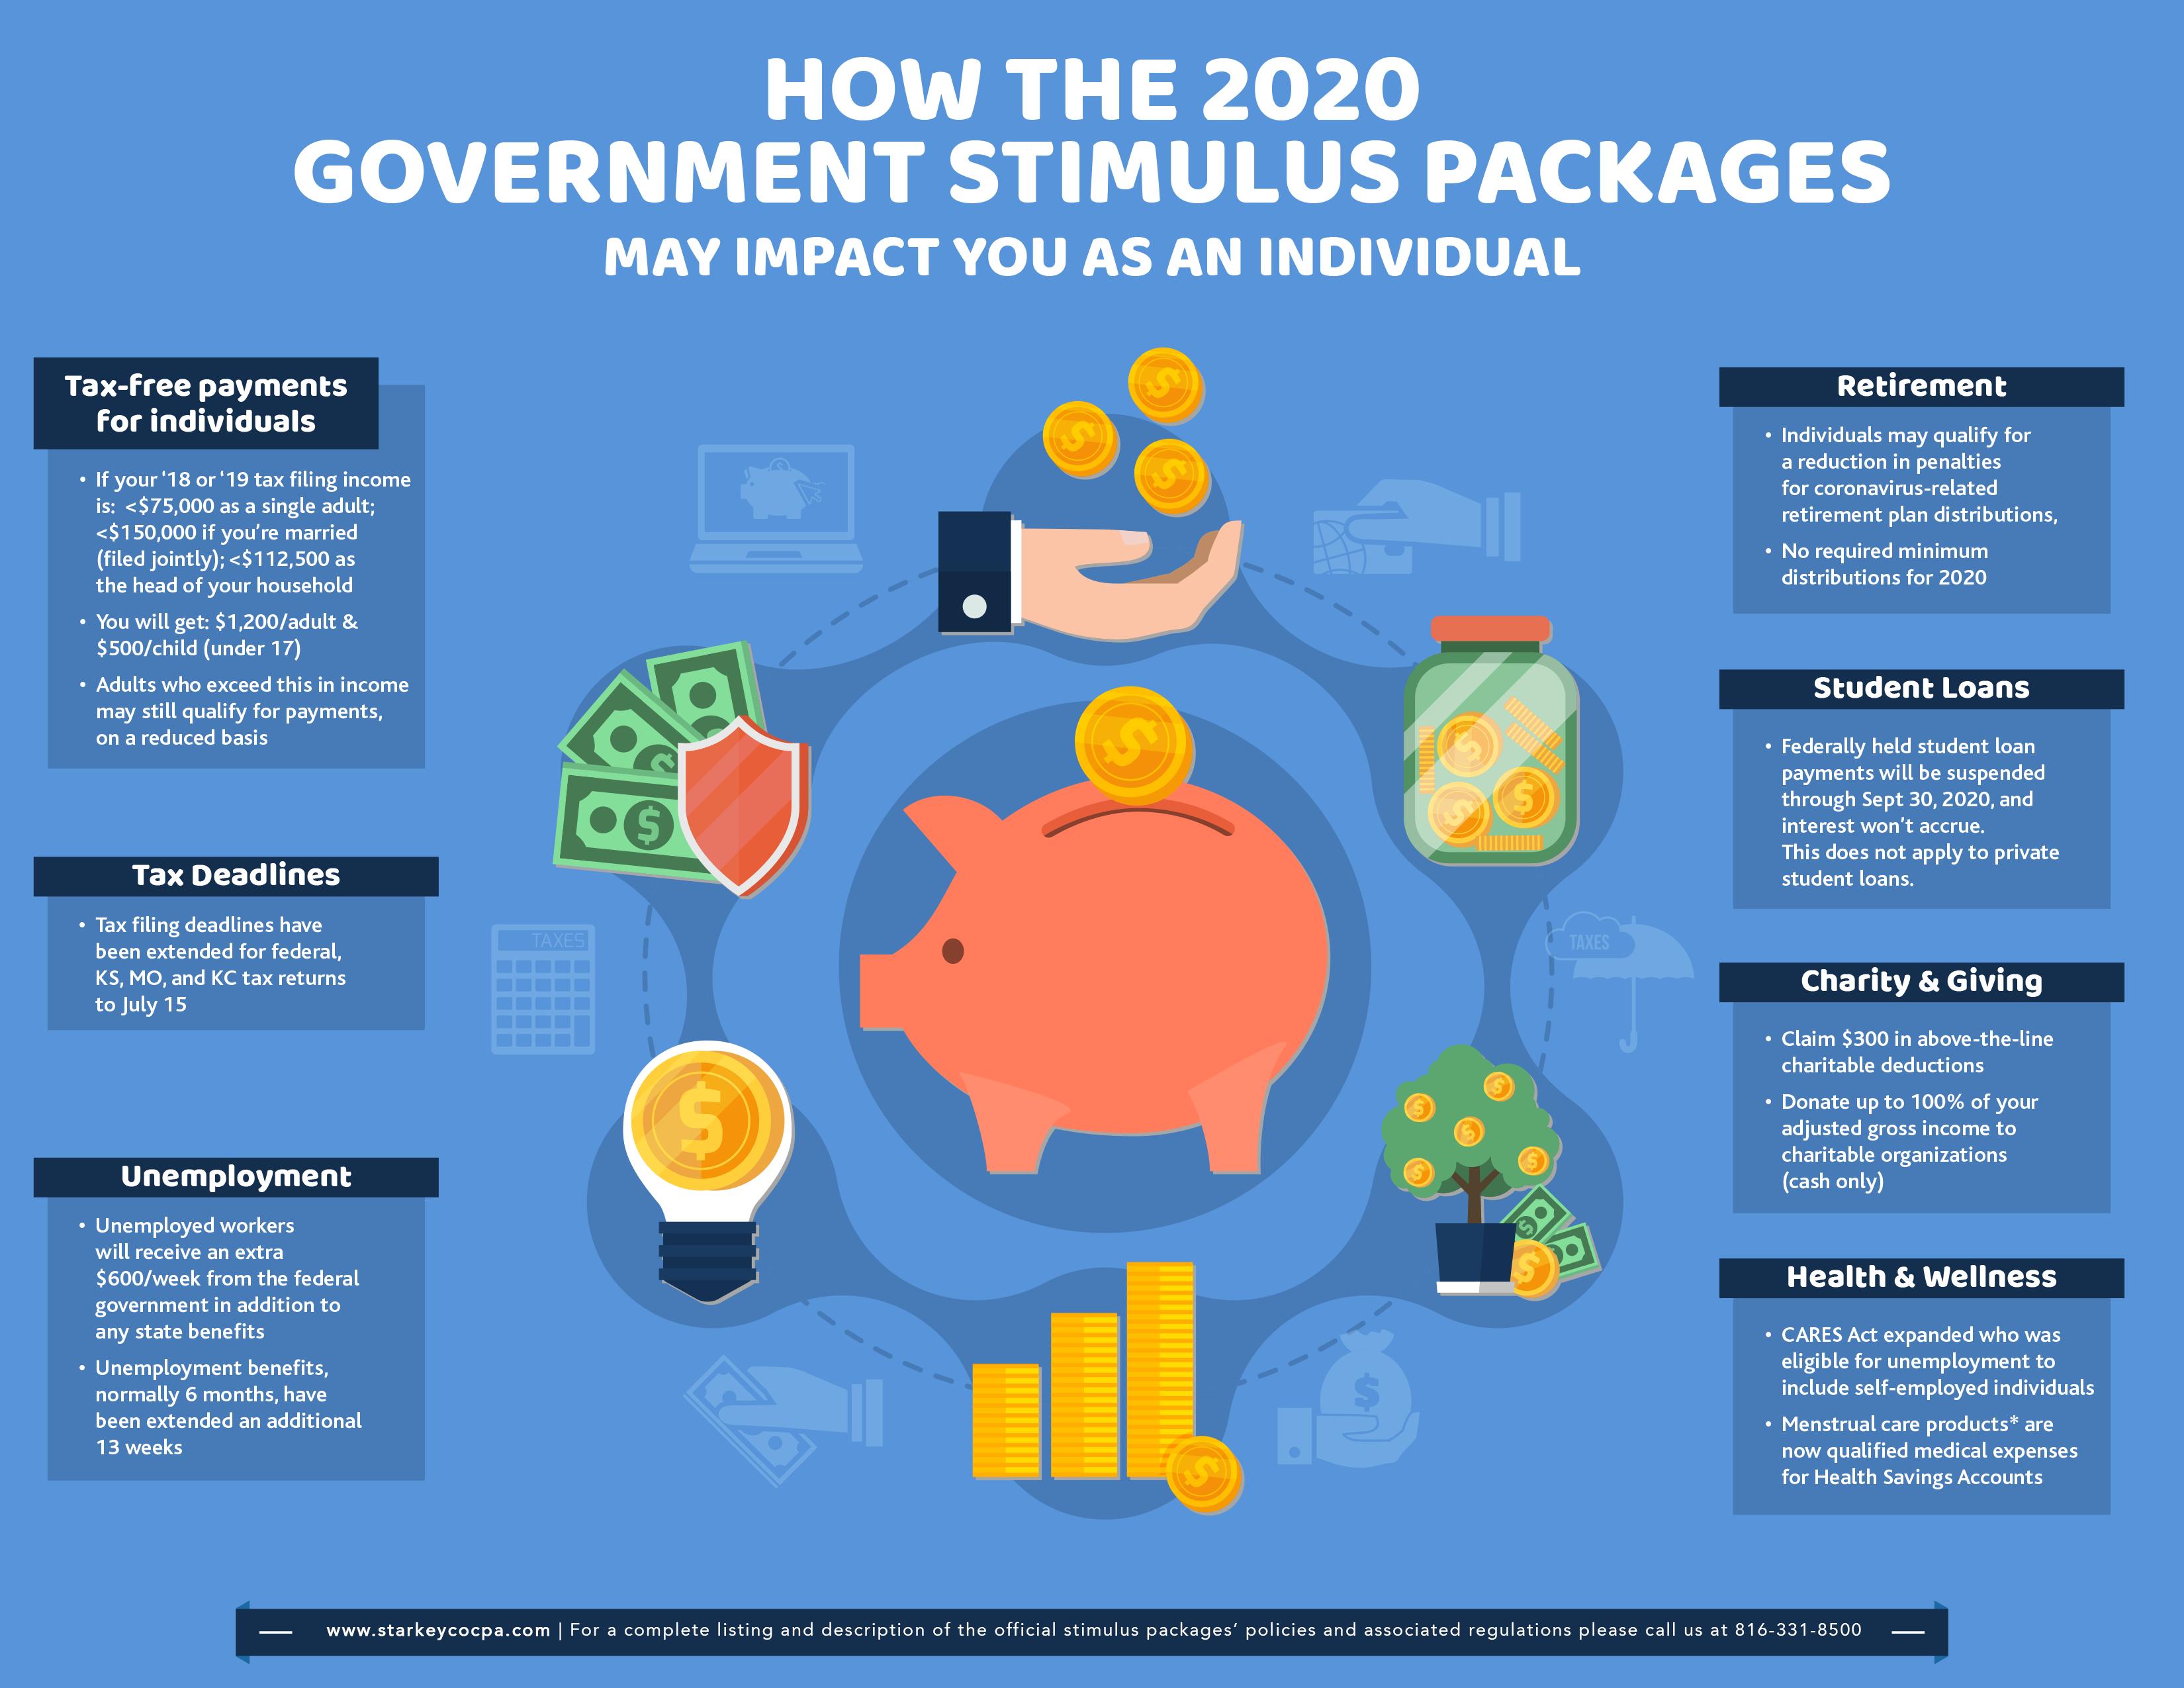 2020 Government Stimulus